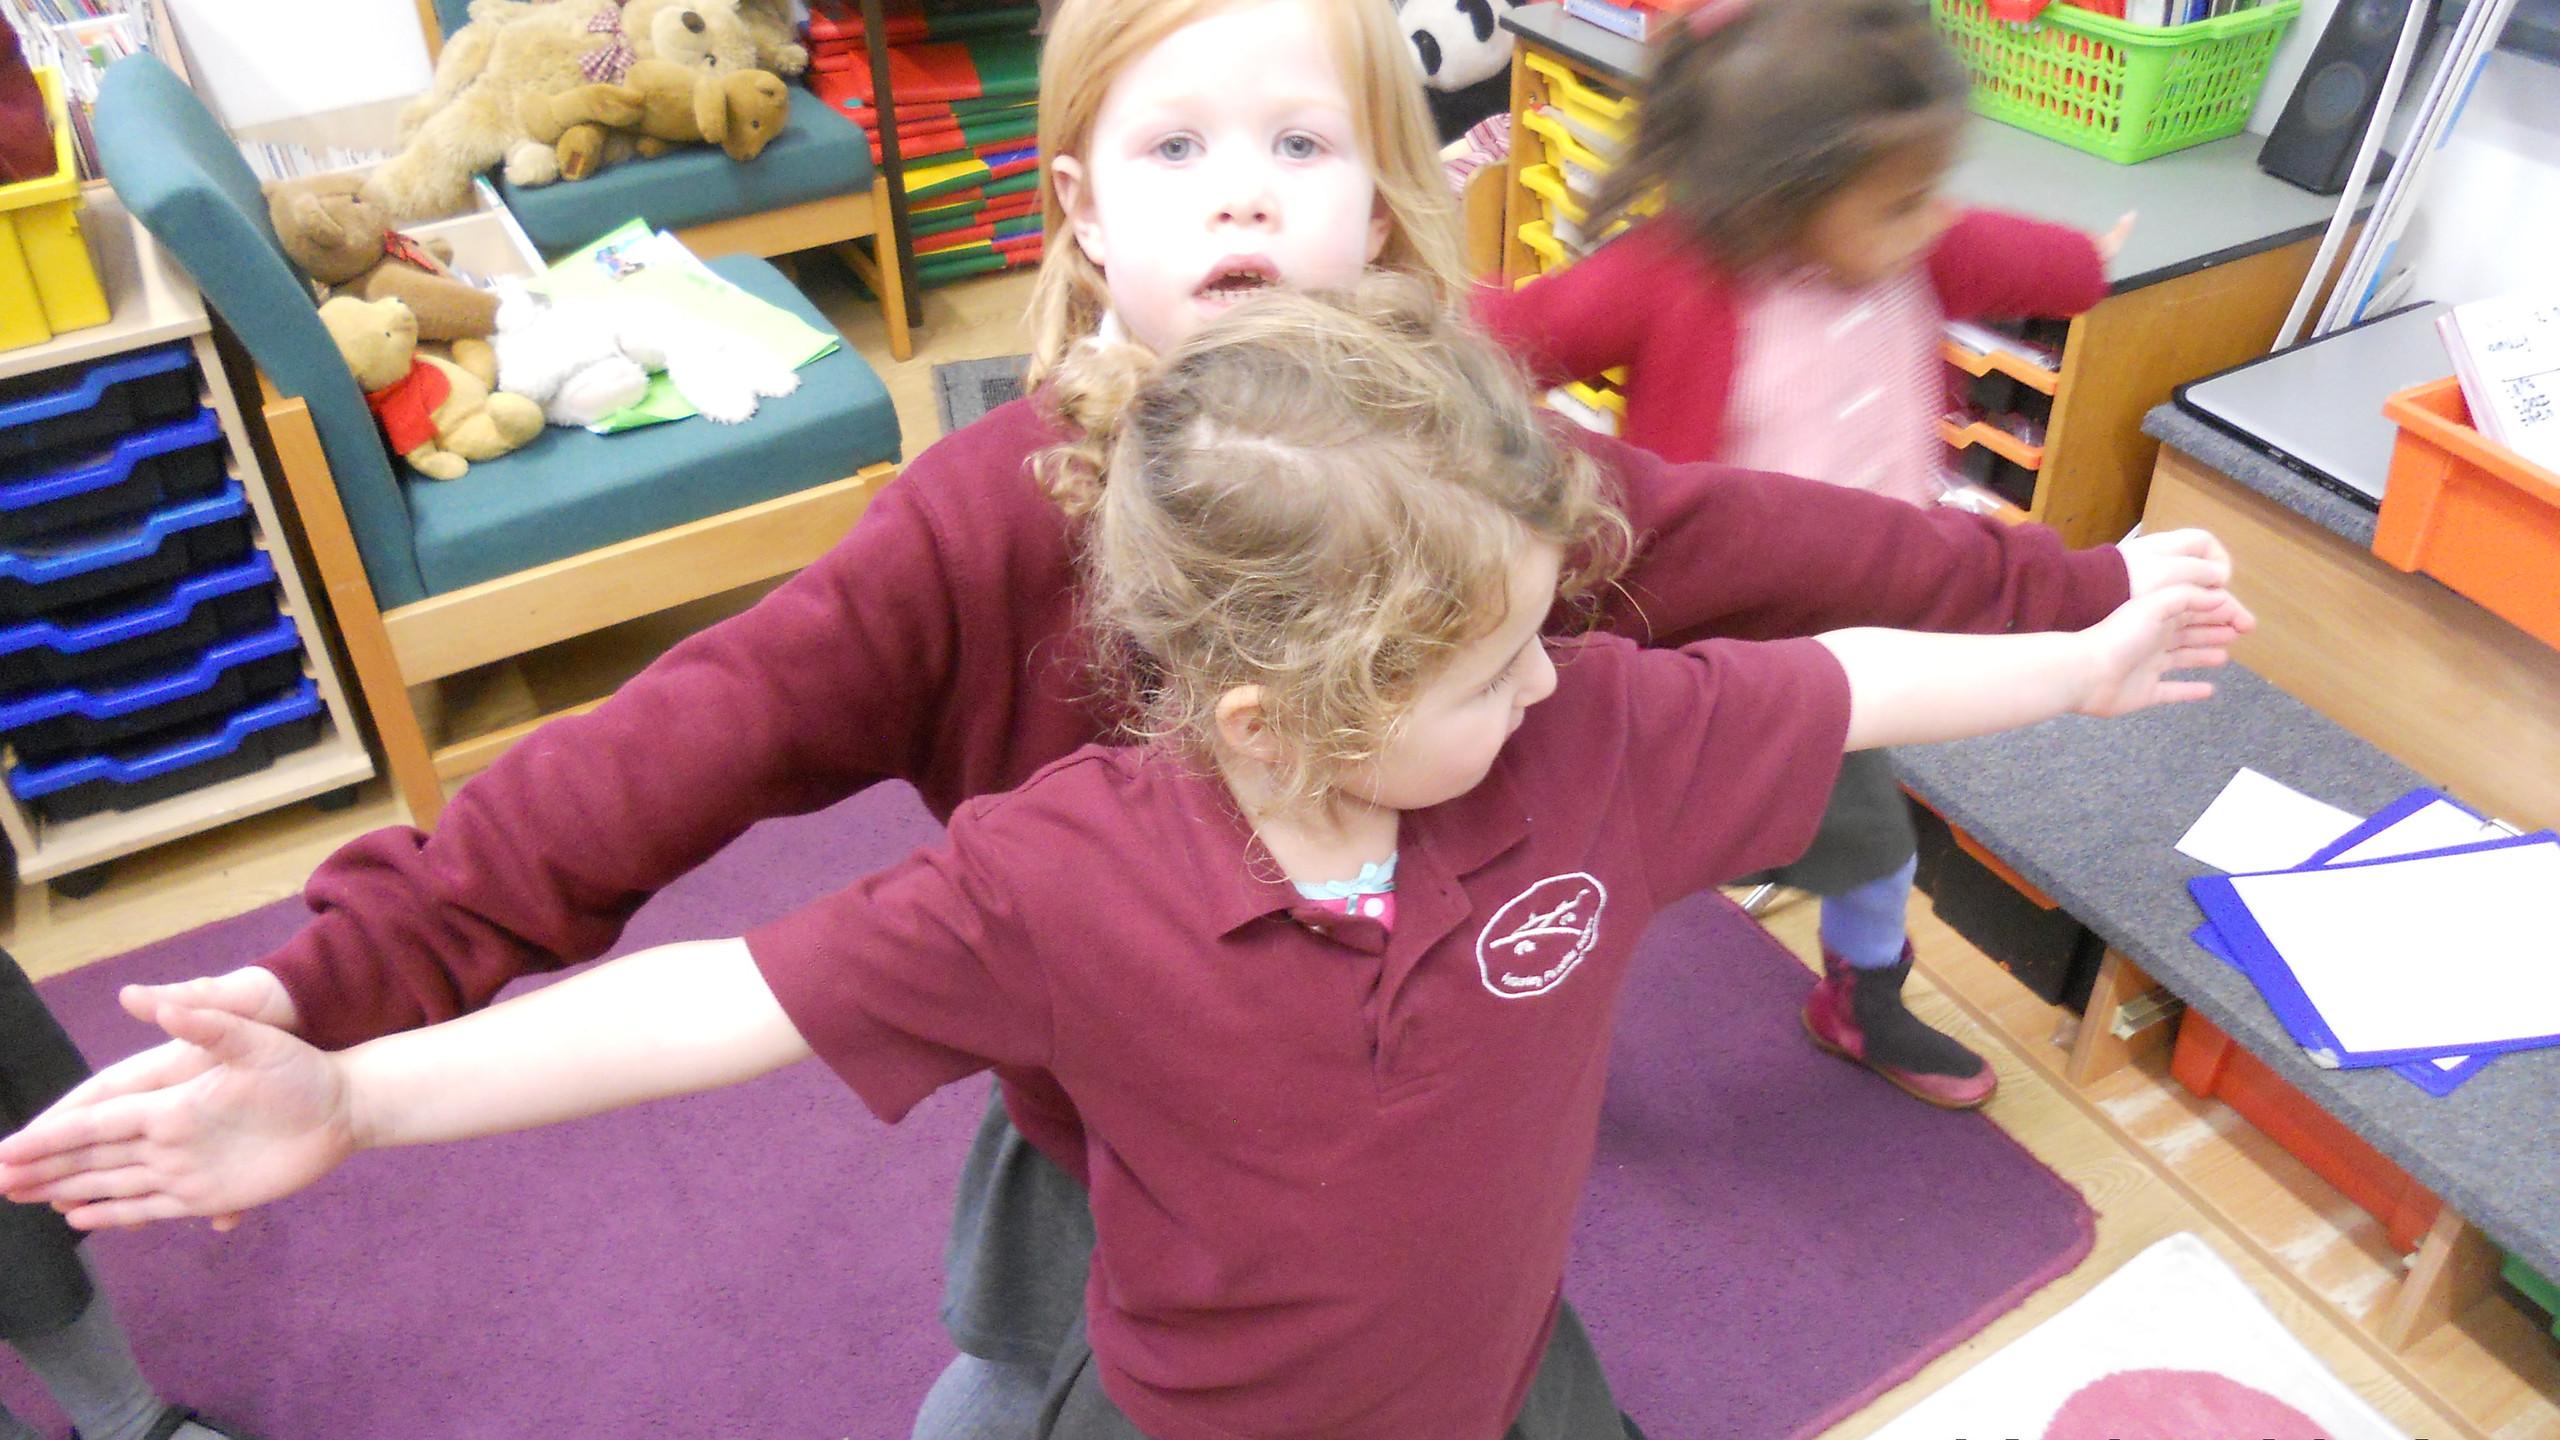 comparing arm spans